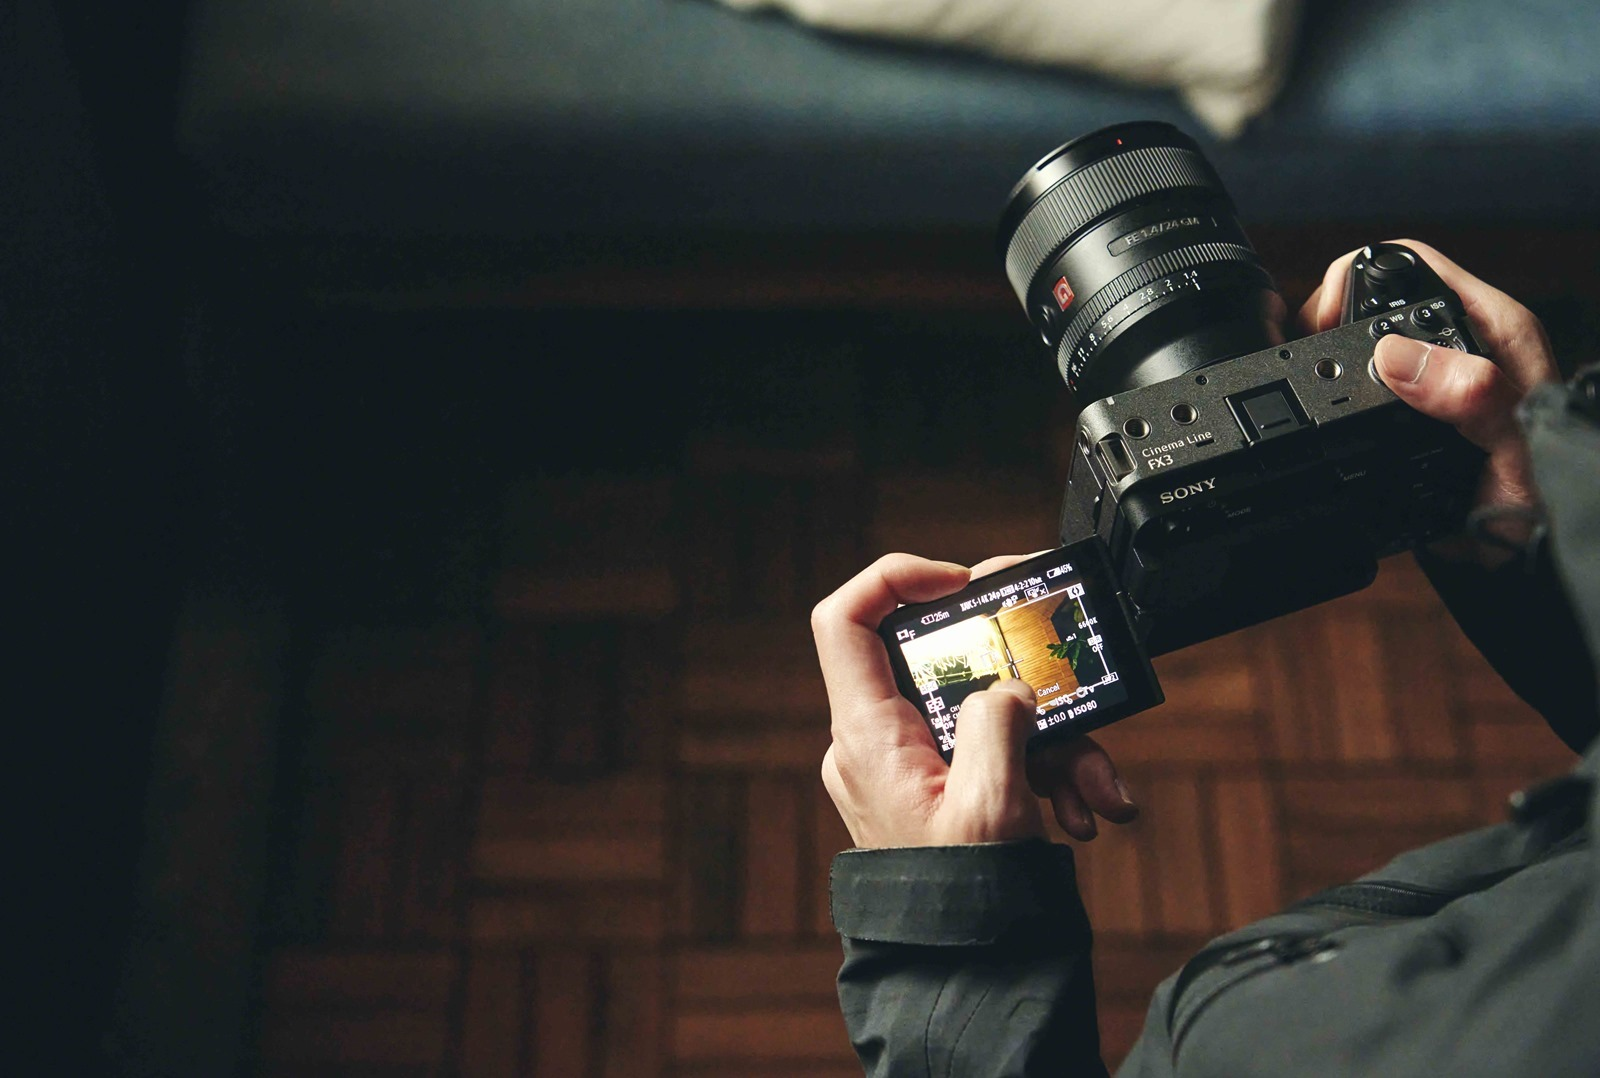 Sony Cinema Line 全片幅數位相機 FX3 專業級攝影機效能結合 α 系列相機對焦表現 輕巧體現電影風格影像 @3C 達人廖阿輝